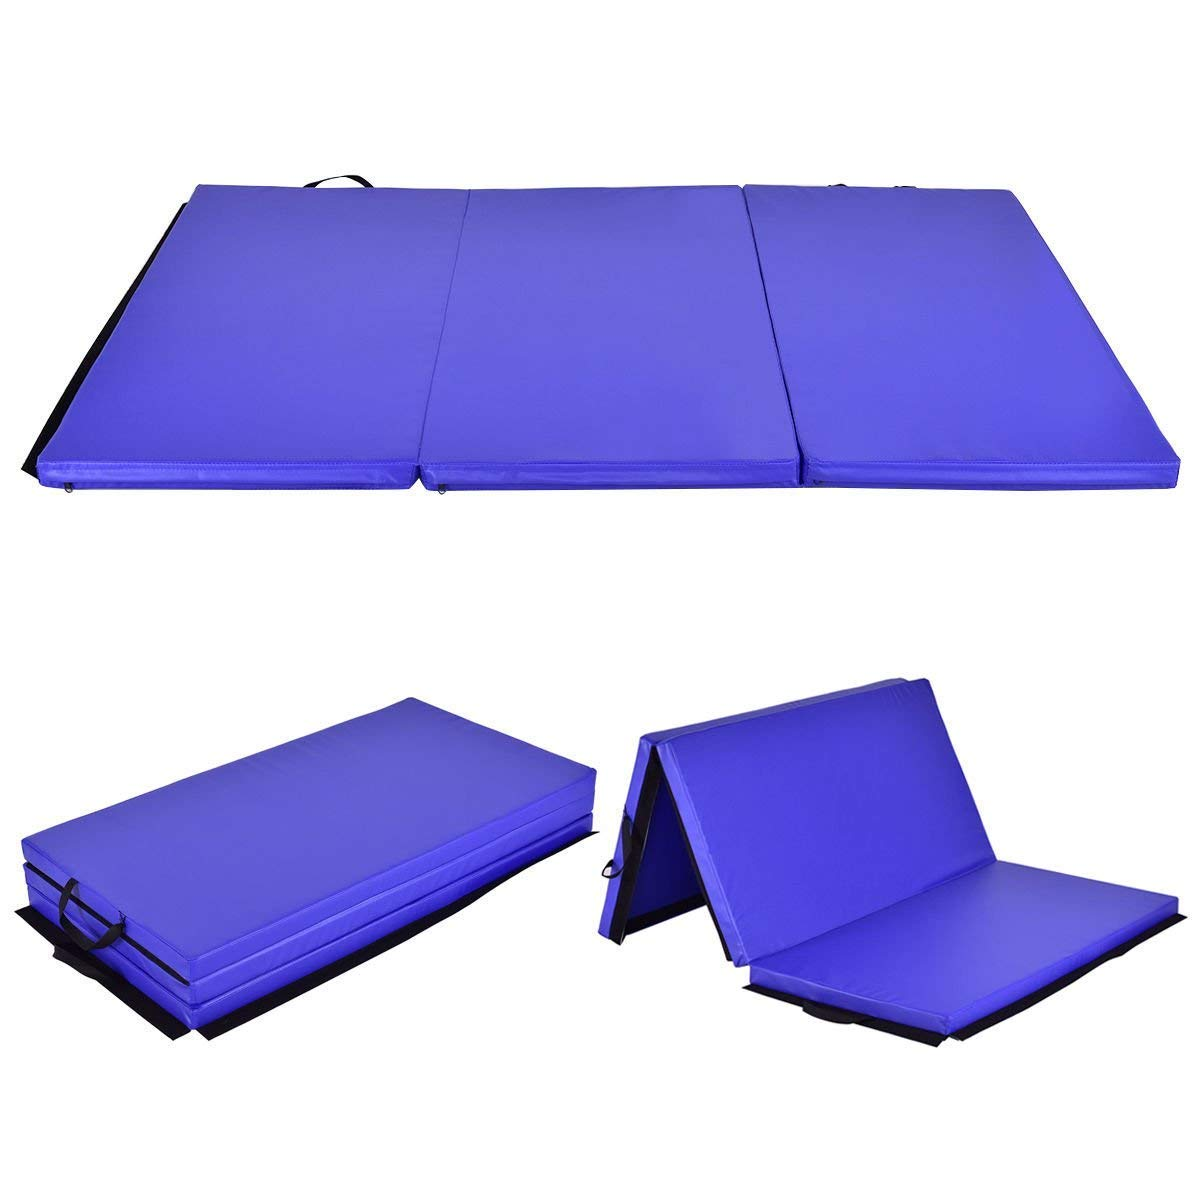 Giantex 6' x 4' Tri-Fold Gymnastics Mat Thick Folding Panel for Gym Fitness Exercise (Blue)